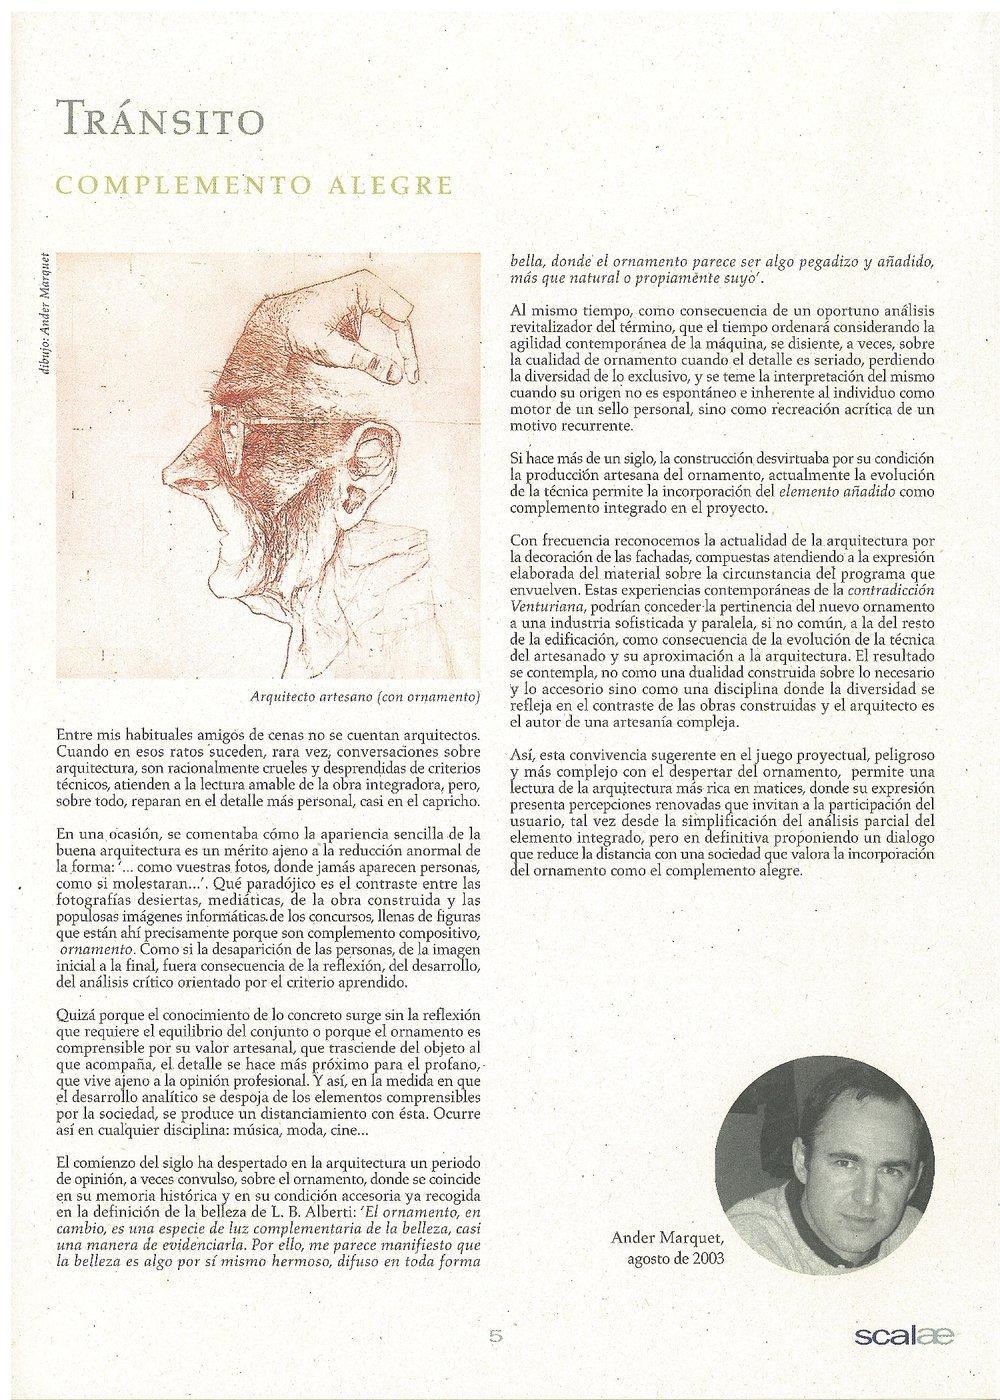 SCALAE - Carme Pinós - Tránsito. Complemento Alegre